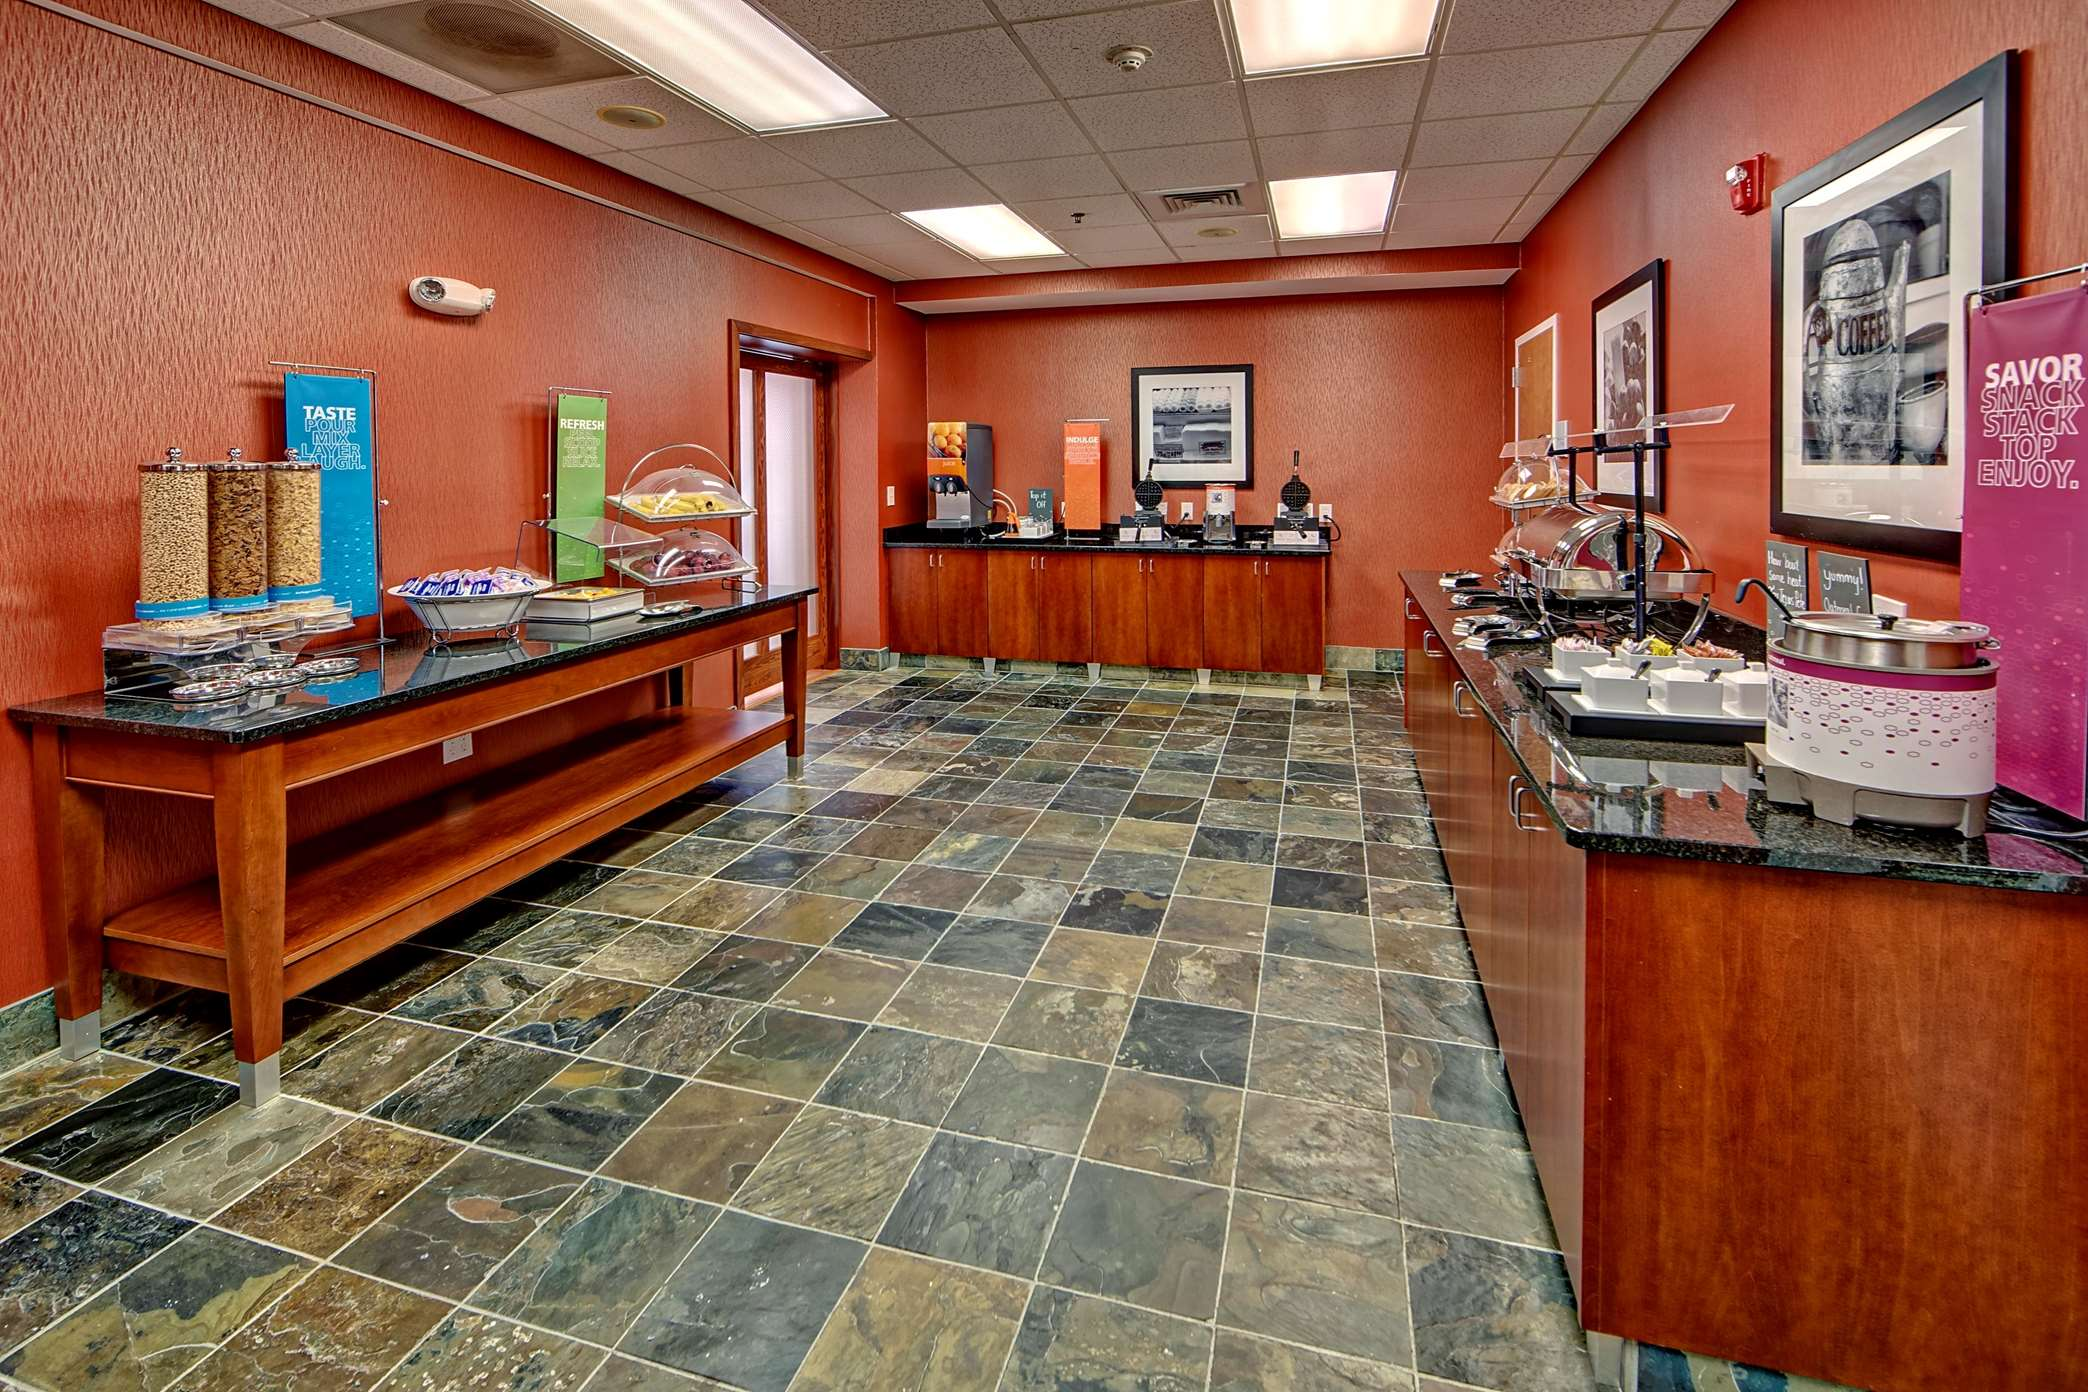 Hampton Inn & Suites Cashiers-Sapphire Valley image 20